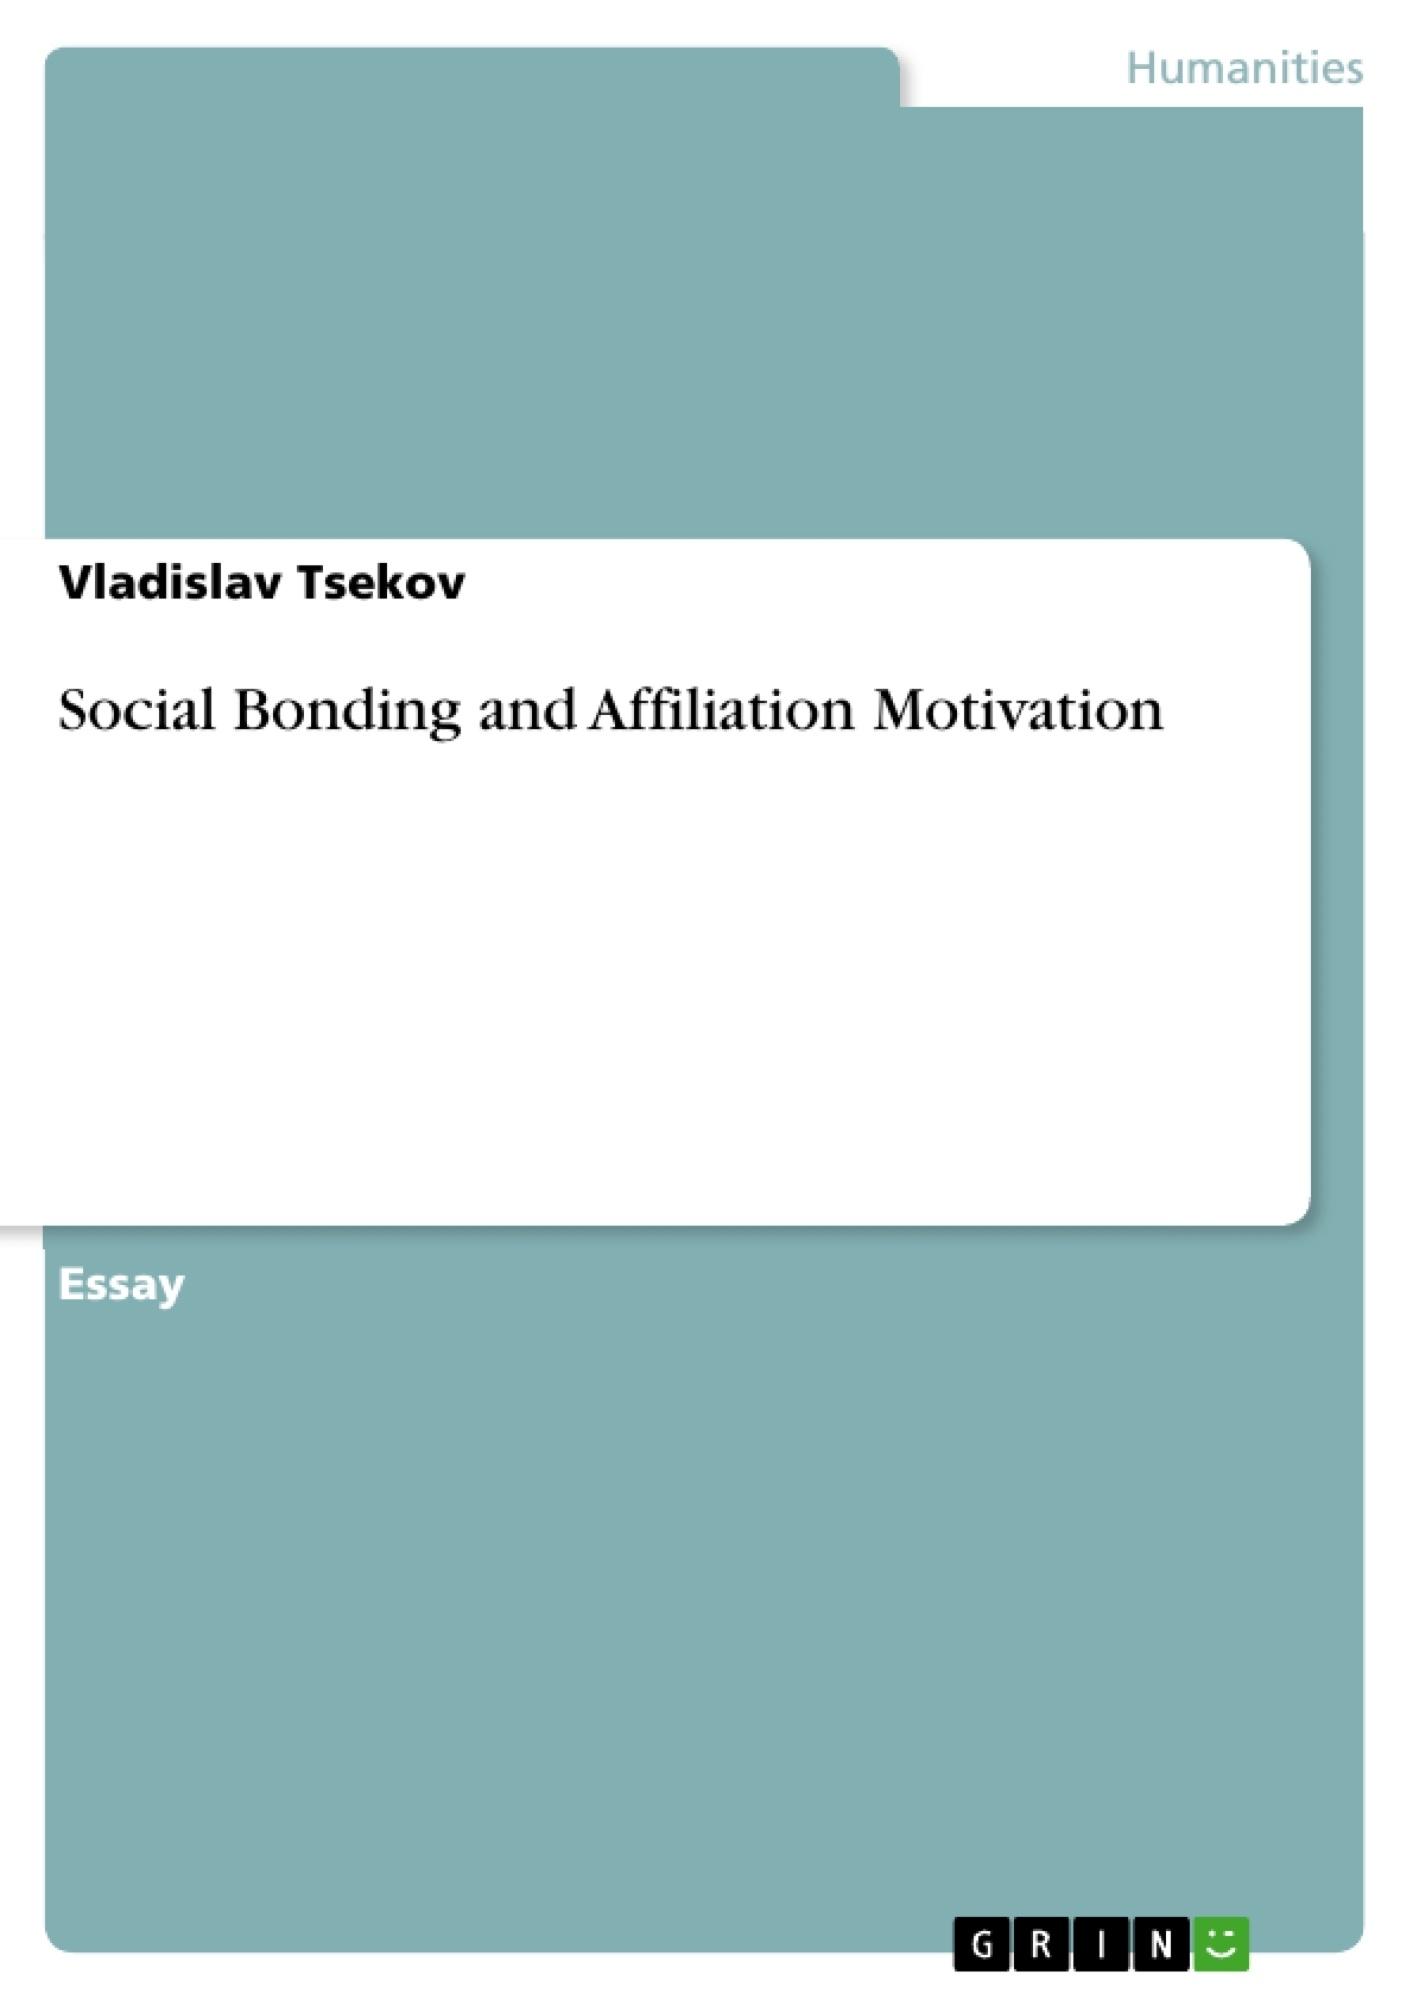 Title: Social Bonding and Affiliation Motivation